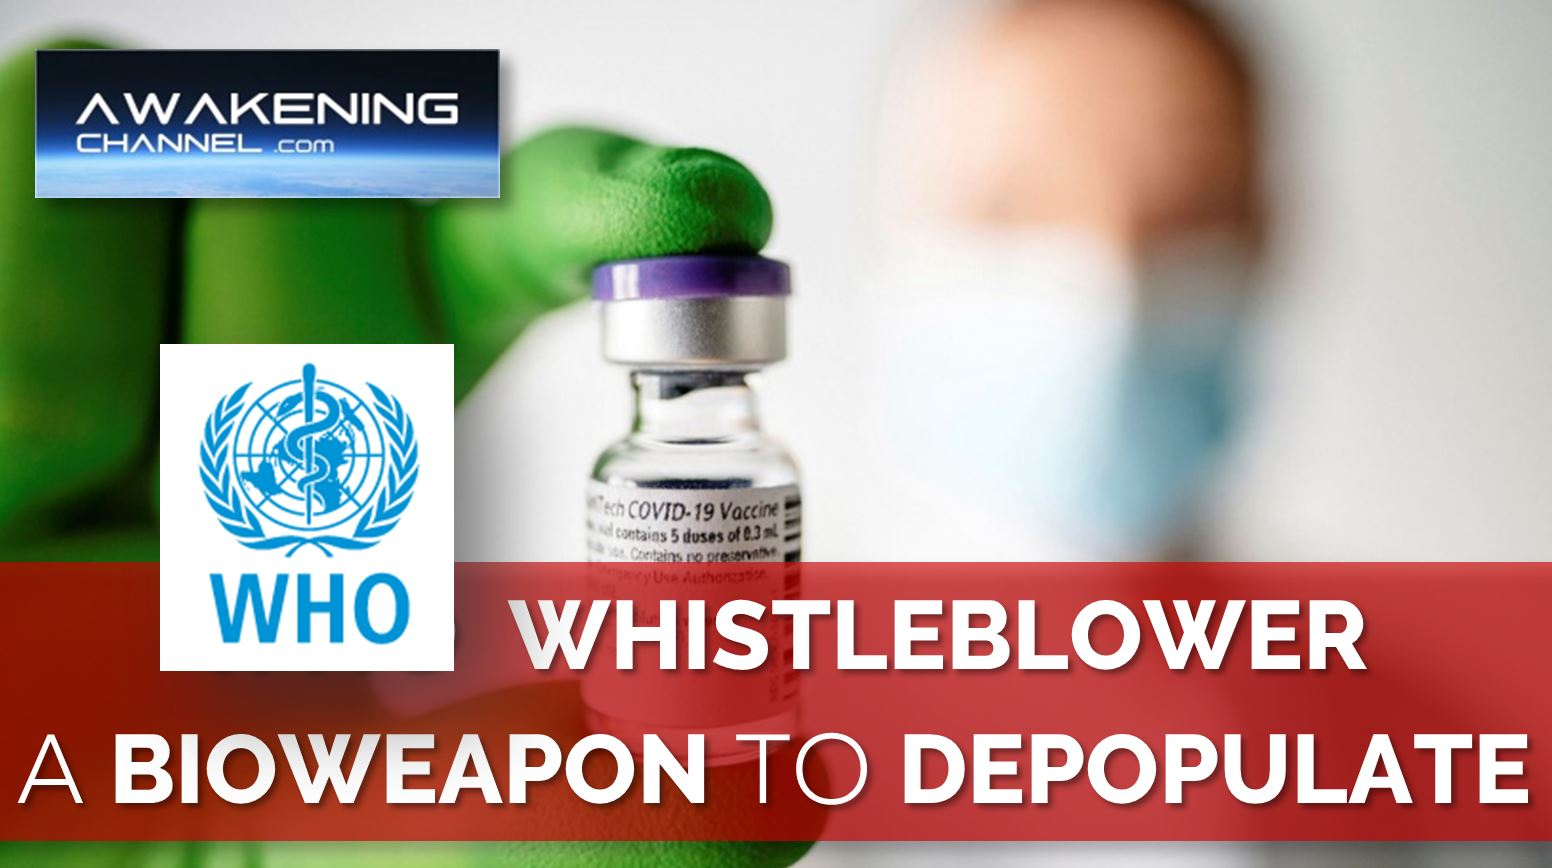 """A BIOWEAPON to DEPOPULATE"", WHO Whistleblower"